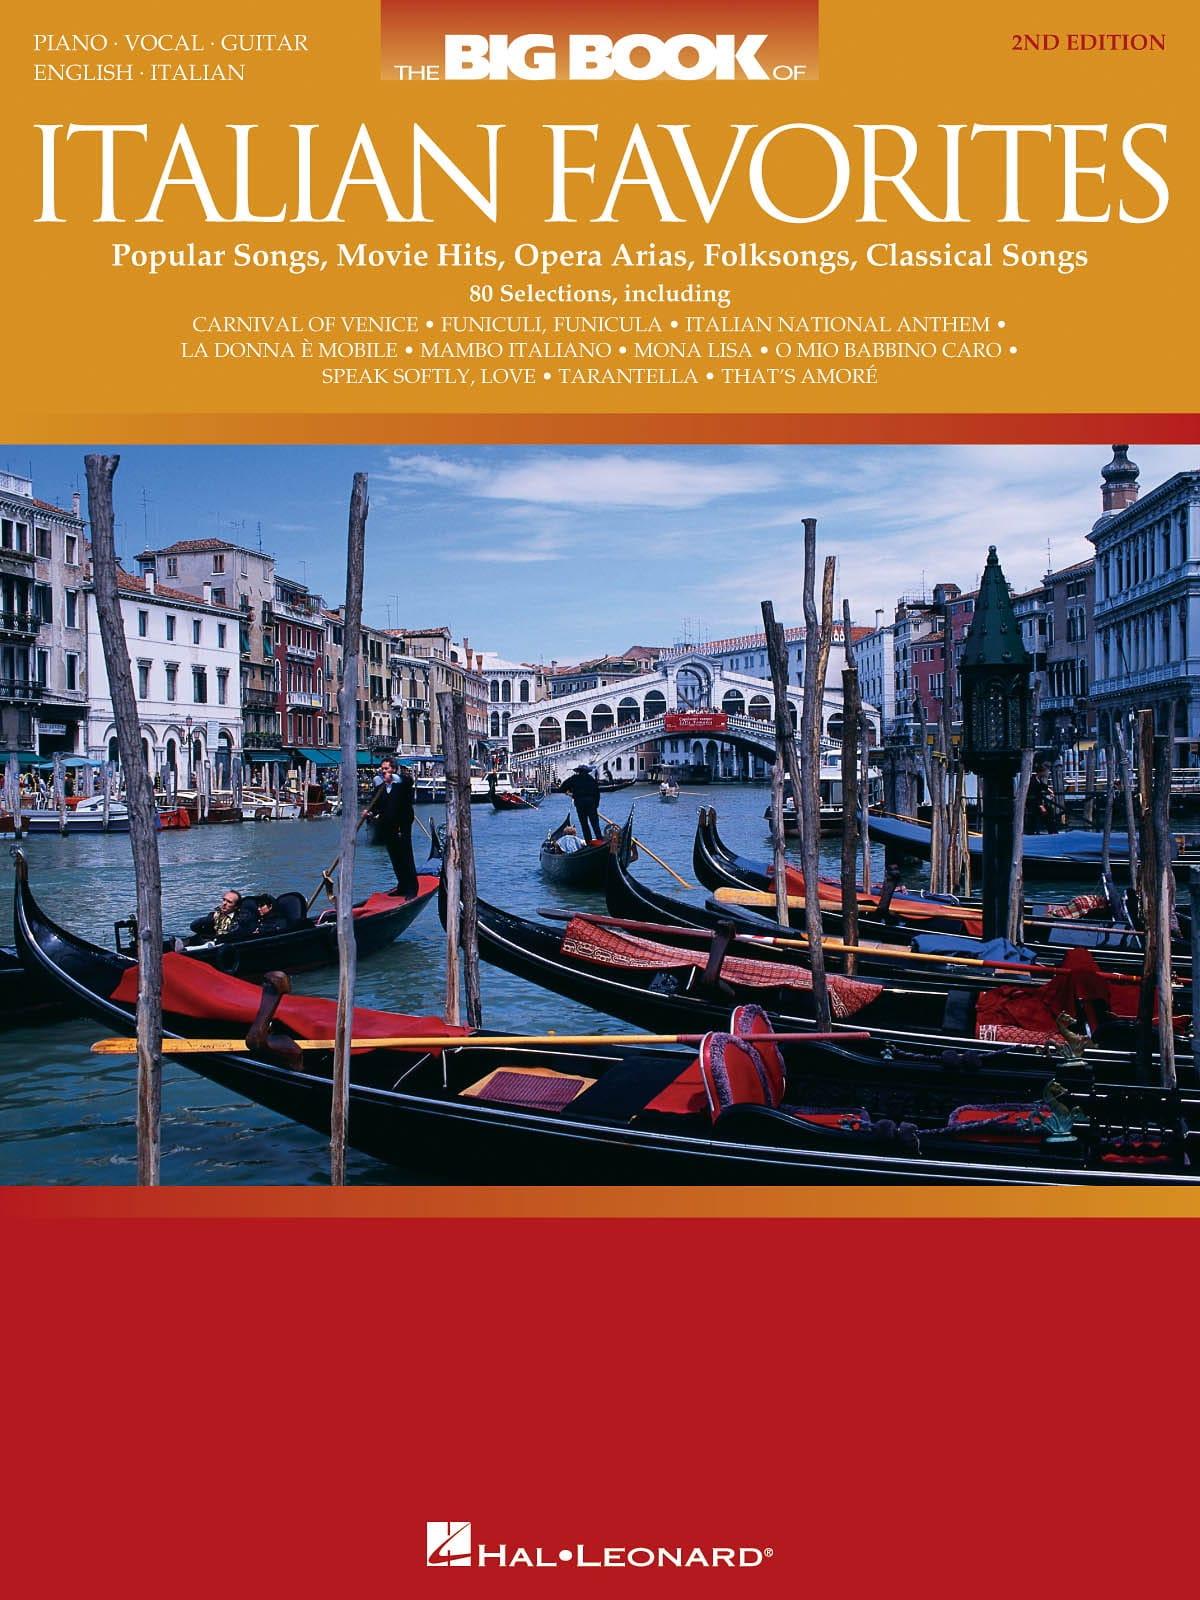 The Big Book of Italian Favorites - Partition - laflutedepan.com